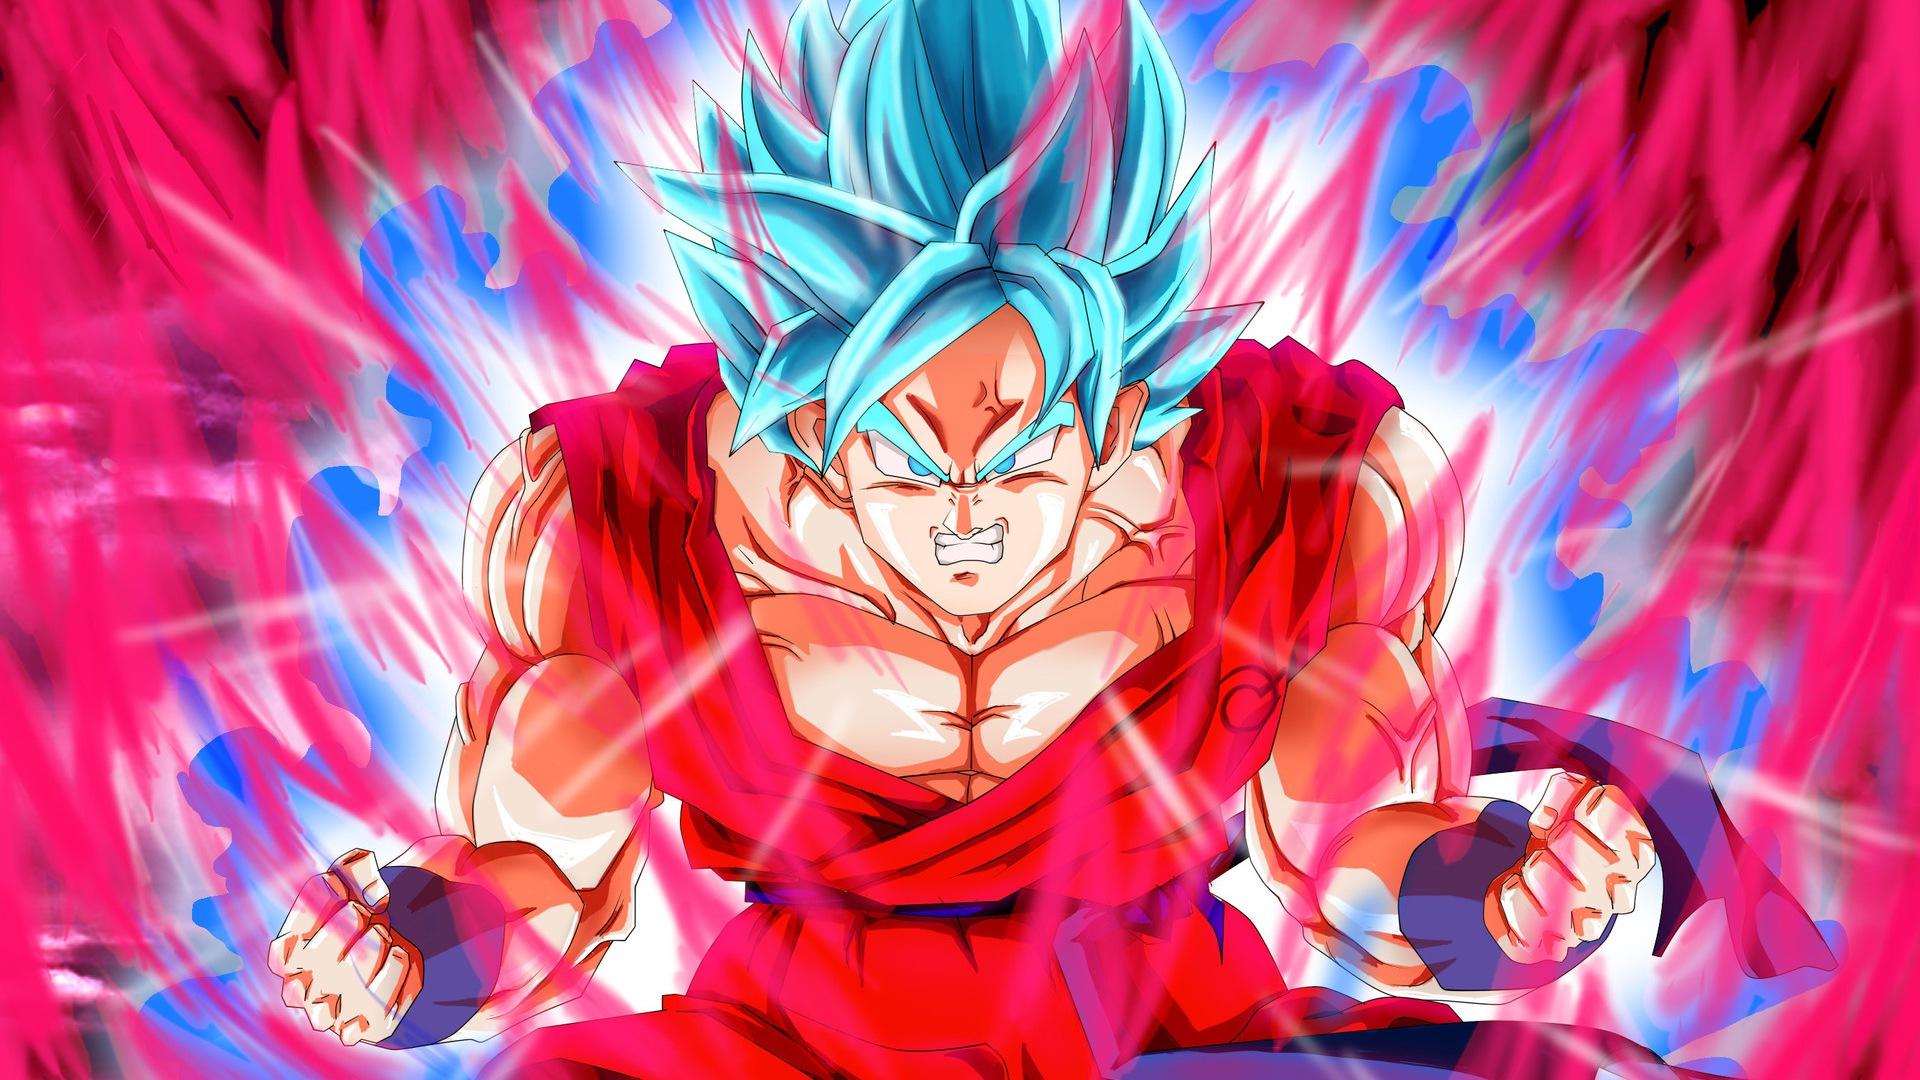 Dragon Ball Super Goku Hd Wallpaper Background Image 1920x1080